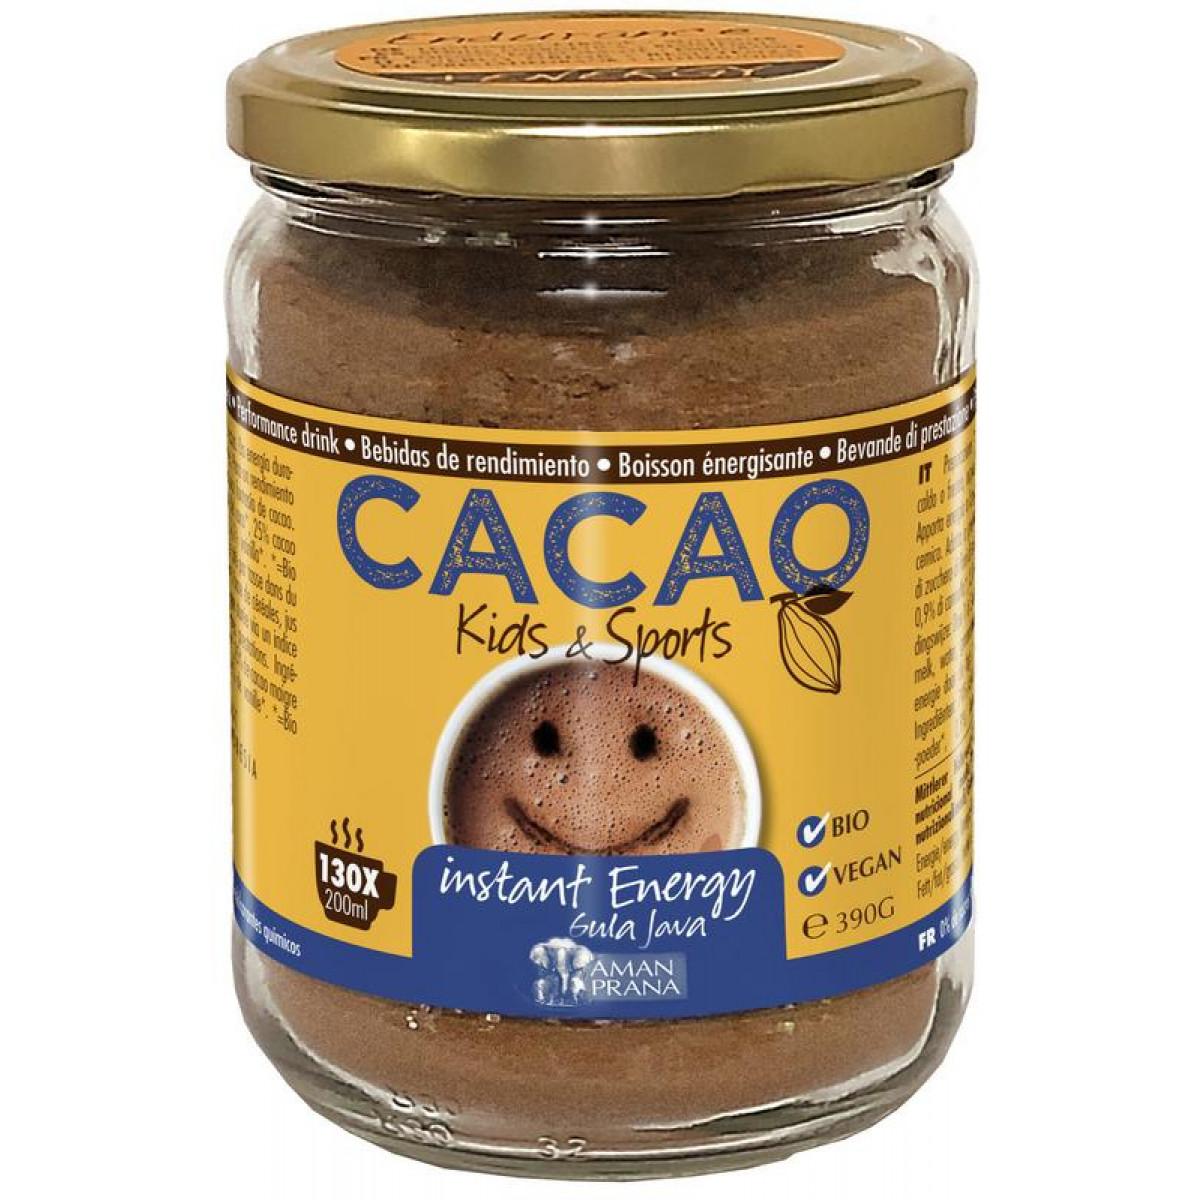 Instant Energy Cacao Kids & Sports 390 gram